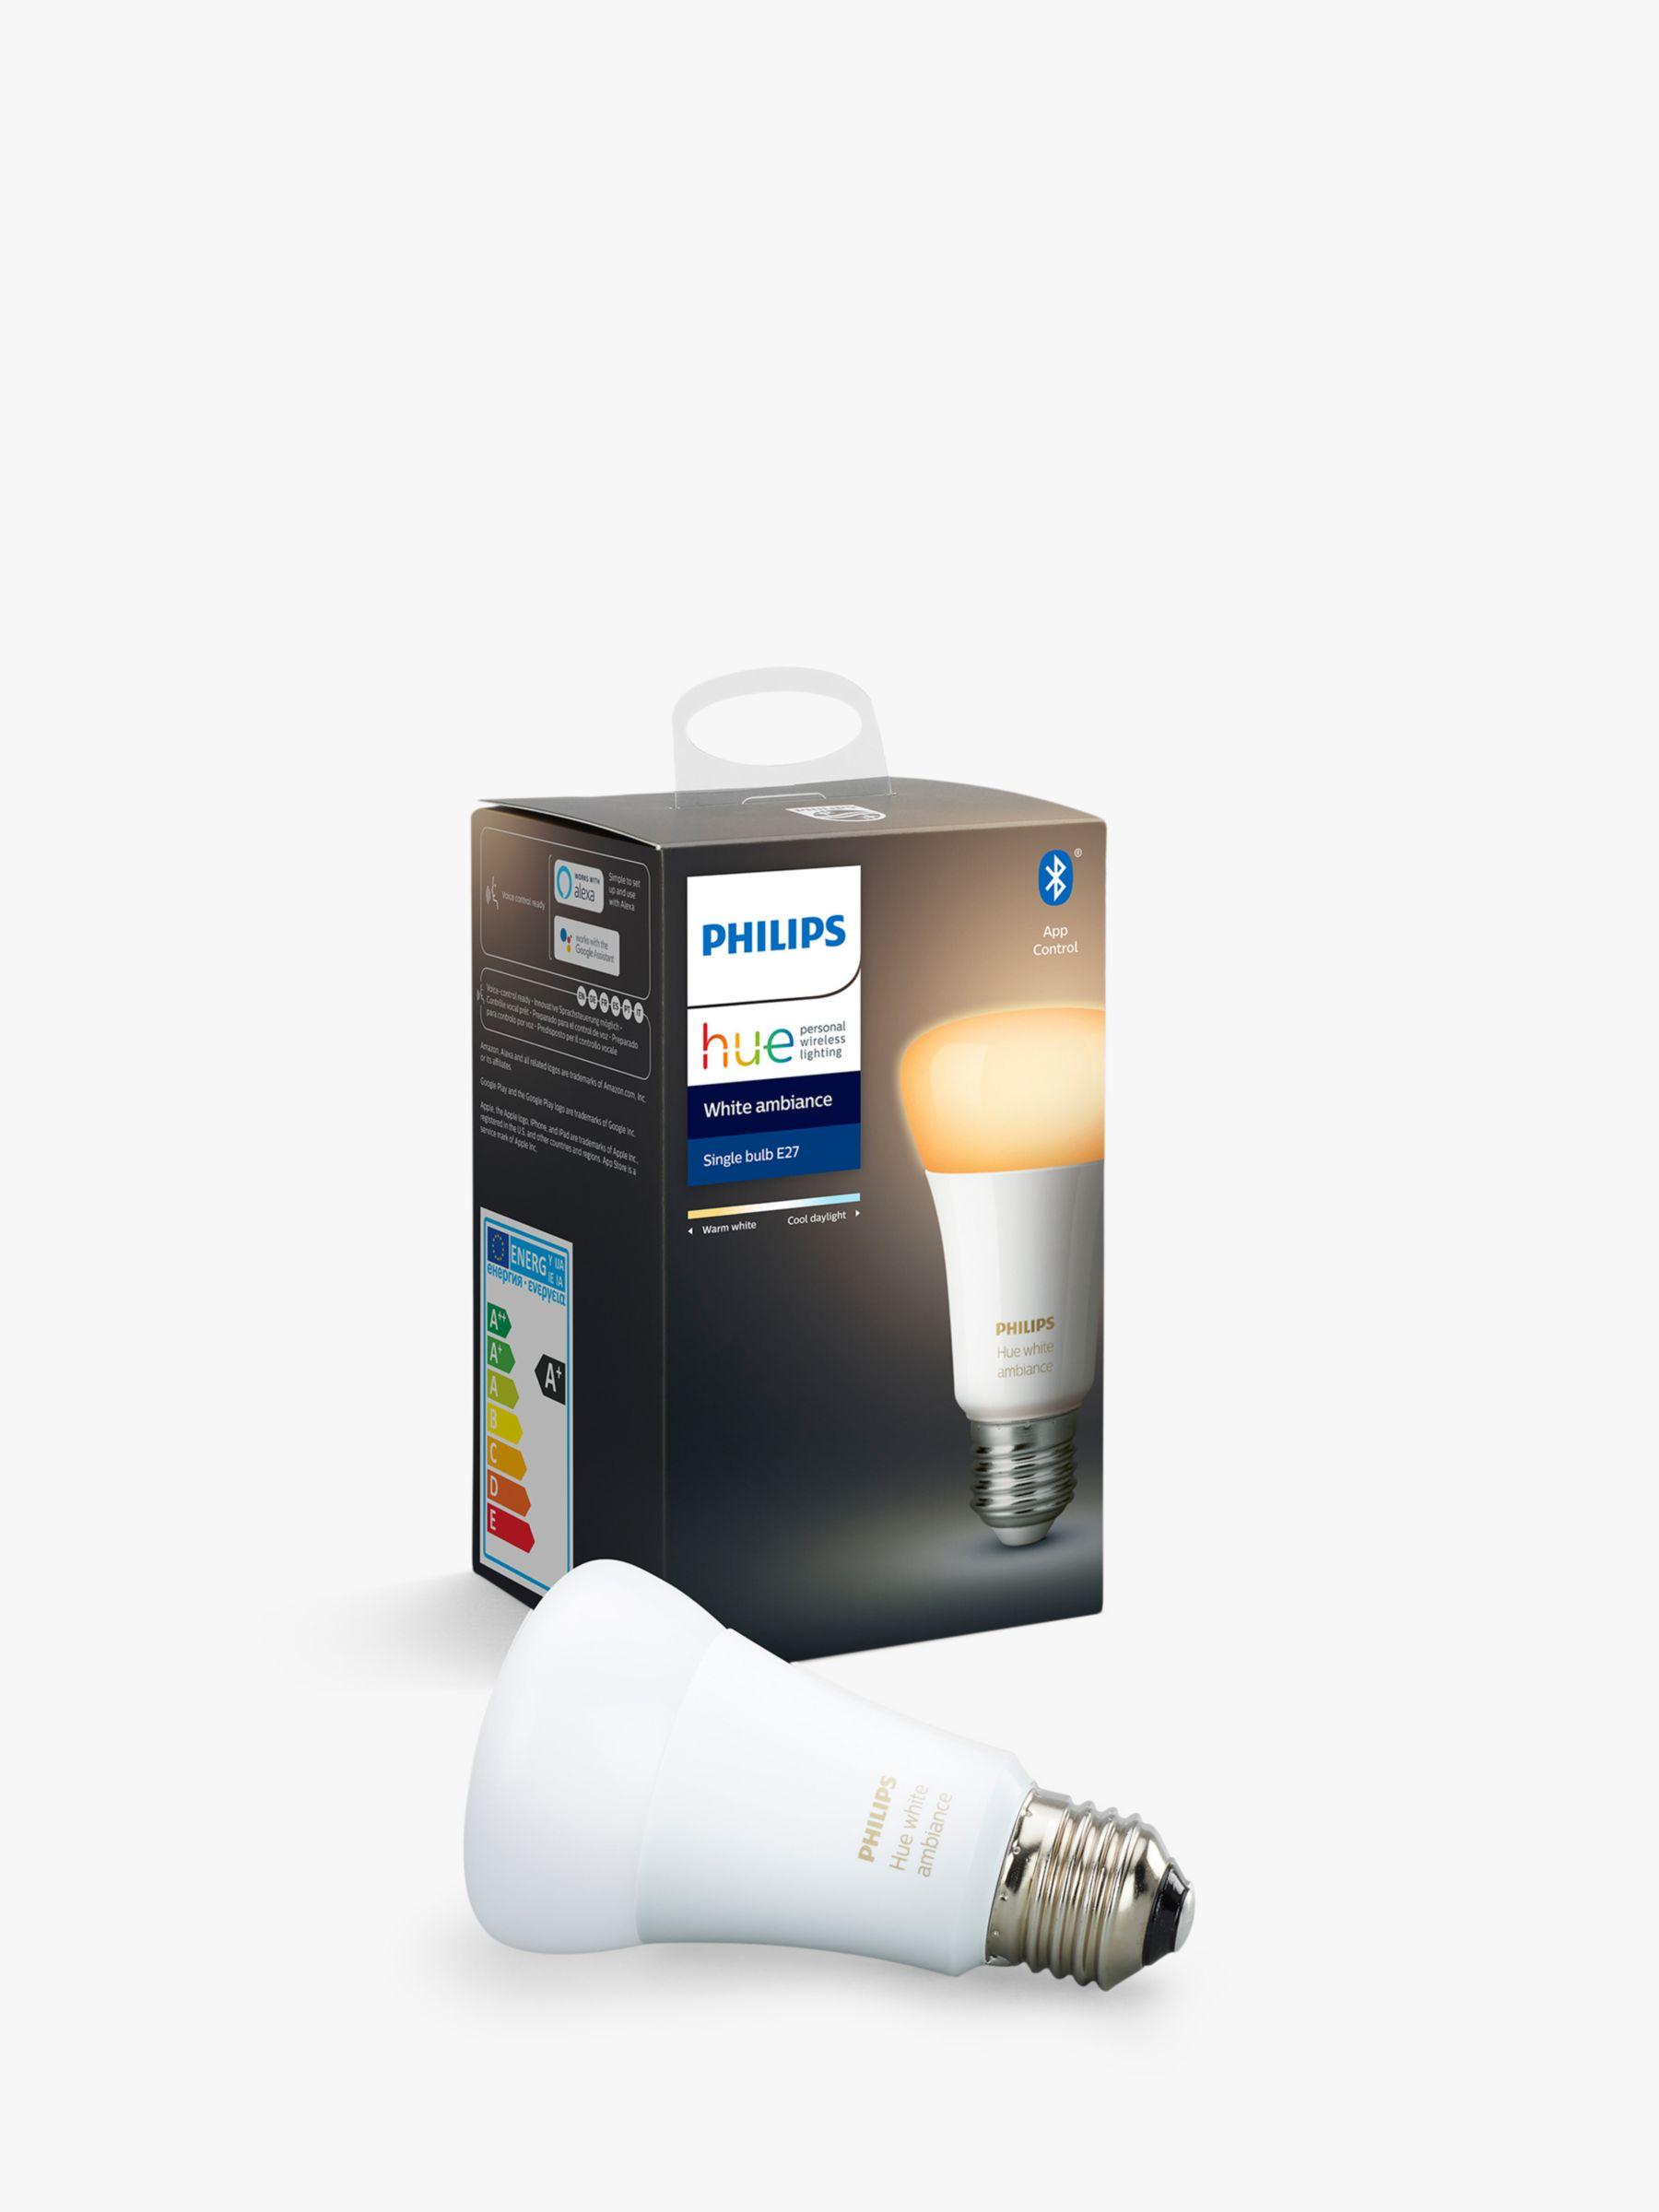 Philips Philips Hue White Ambiance Wireless Lighting LED Light Bulb with Bluetooth, 9W A60 E27 Edison Screw Cap Bulb, Single